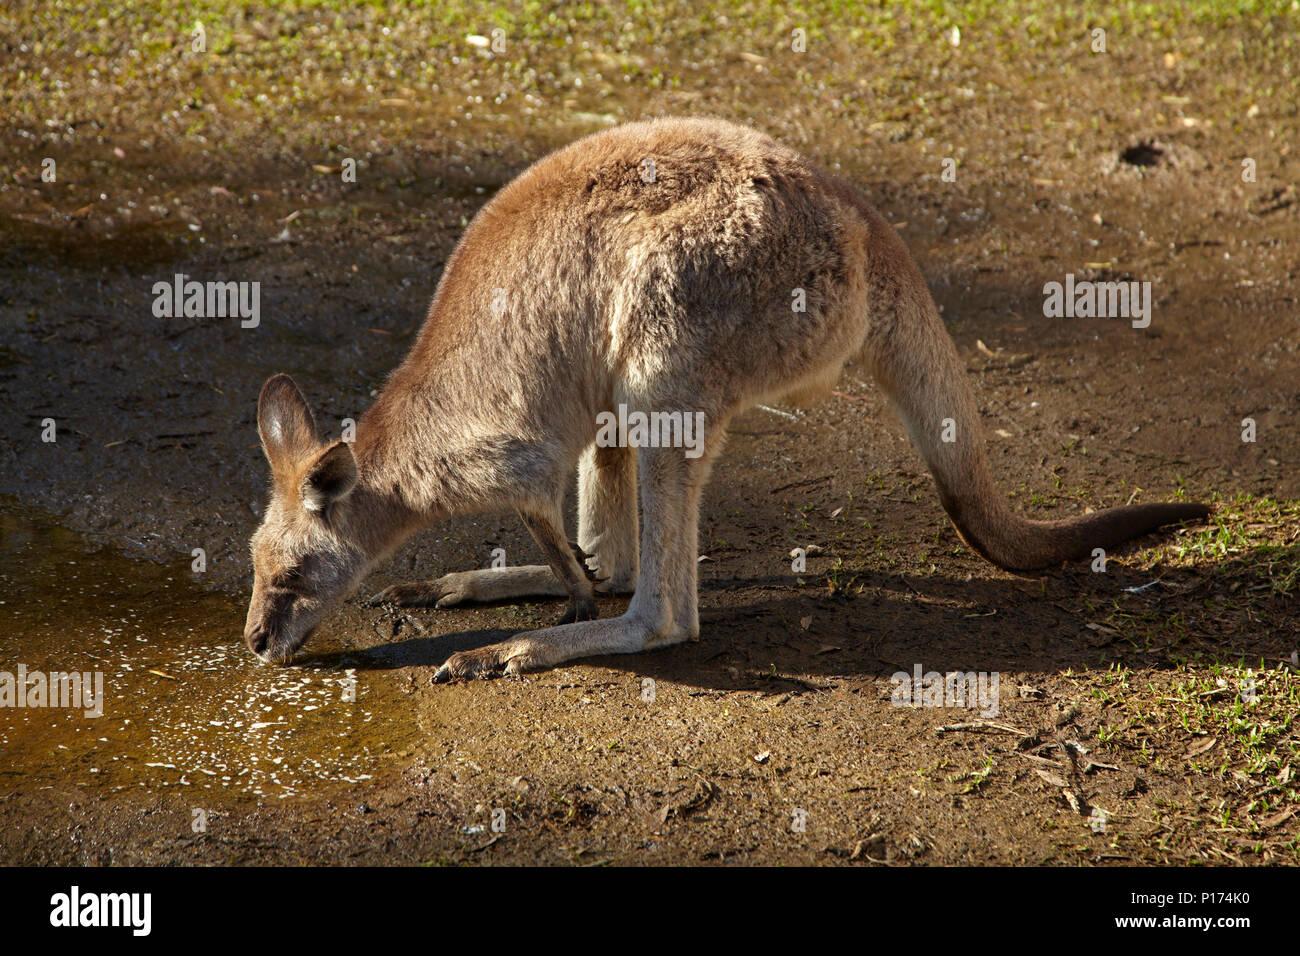 Grey Kangaroo (Macropus giganteus), Australia - Stock Image